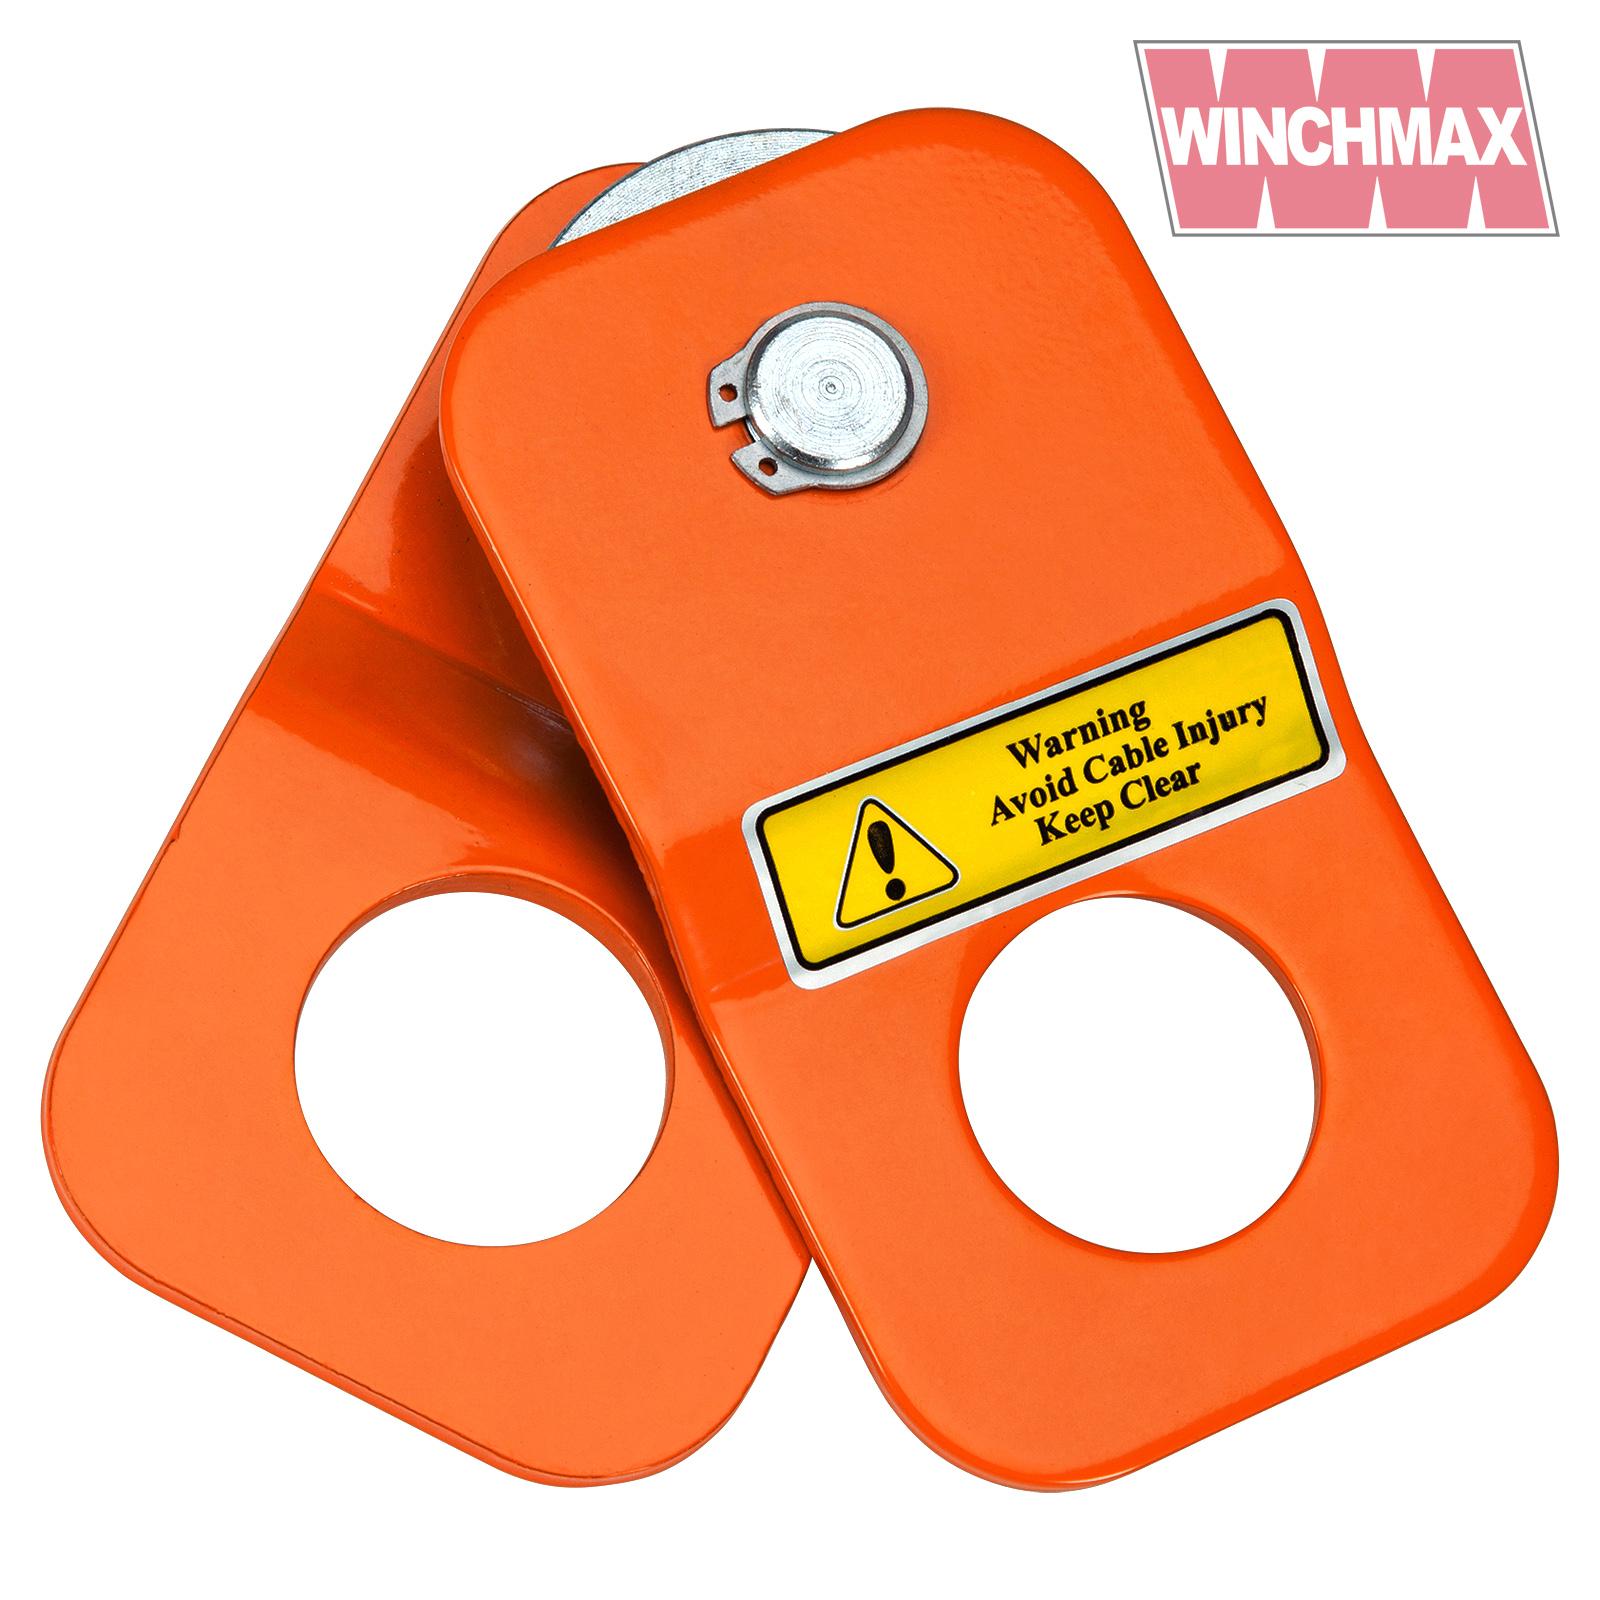 Wmsb4 winchmax 393 copy